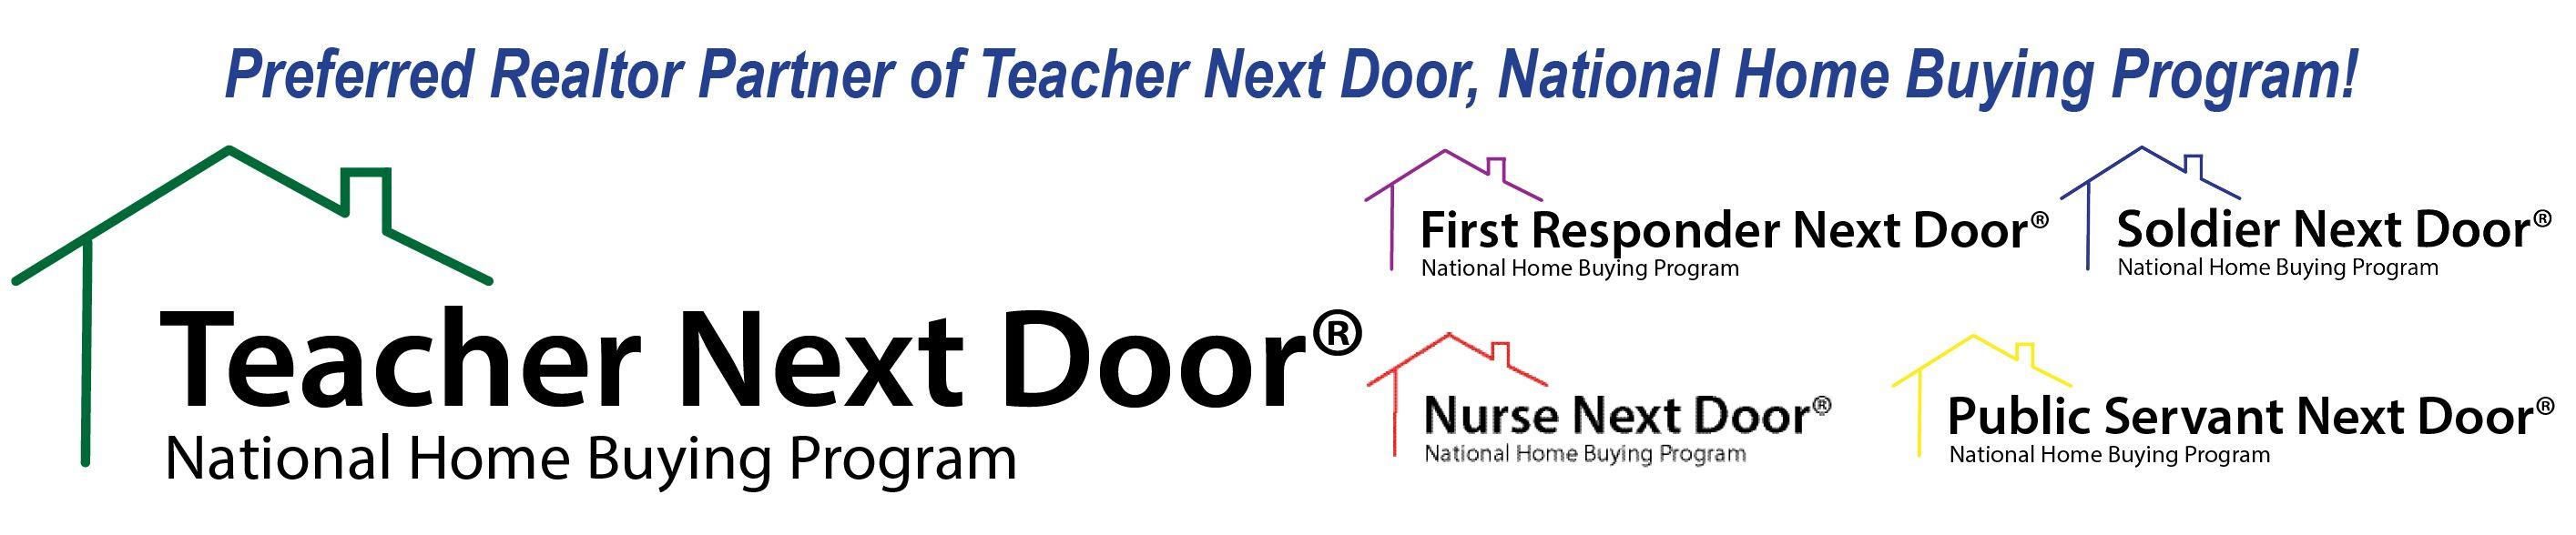 Contact Us About Our Housing Grants If You Are A Teacher Nurse Police Officer Firefighter Active Duty Military Teacher Next Door Teacher Nurse Next Door